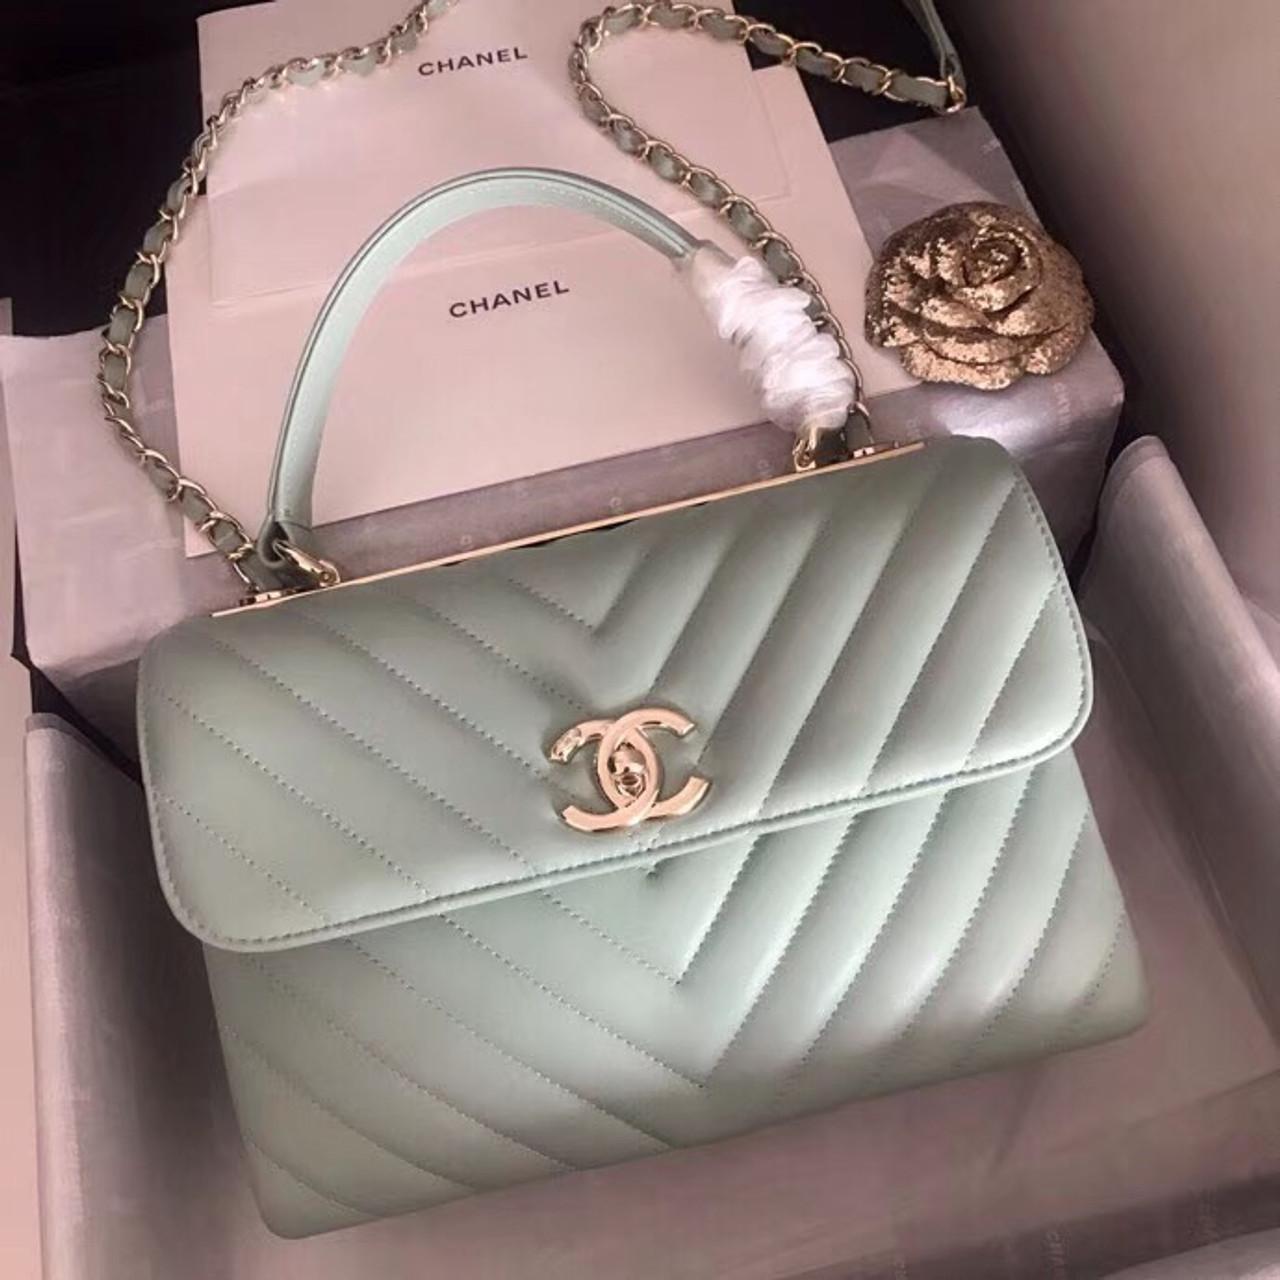 b22e50a0e91d Chanel Small Flap Bag With Top Handle 2019 A69923 Mint - Bella Vita Moda